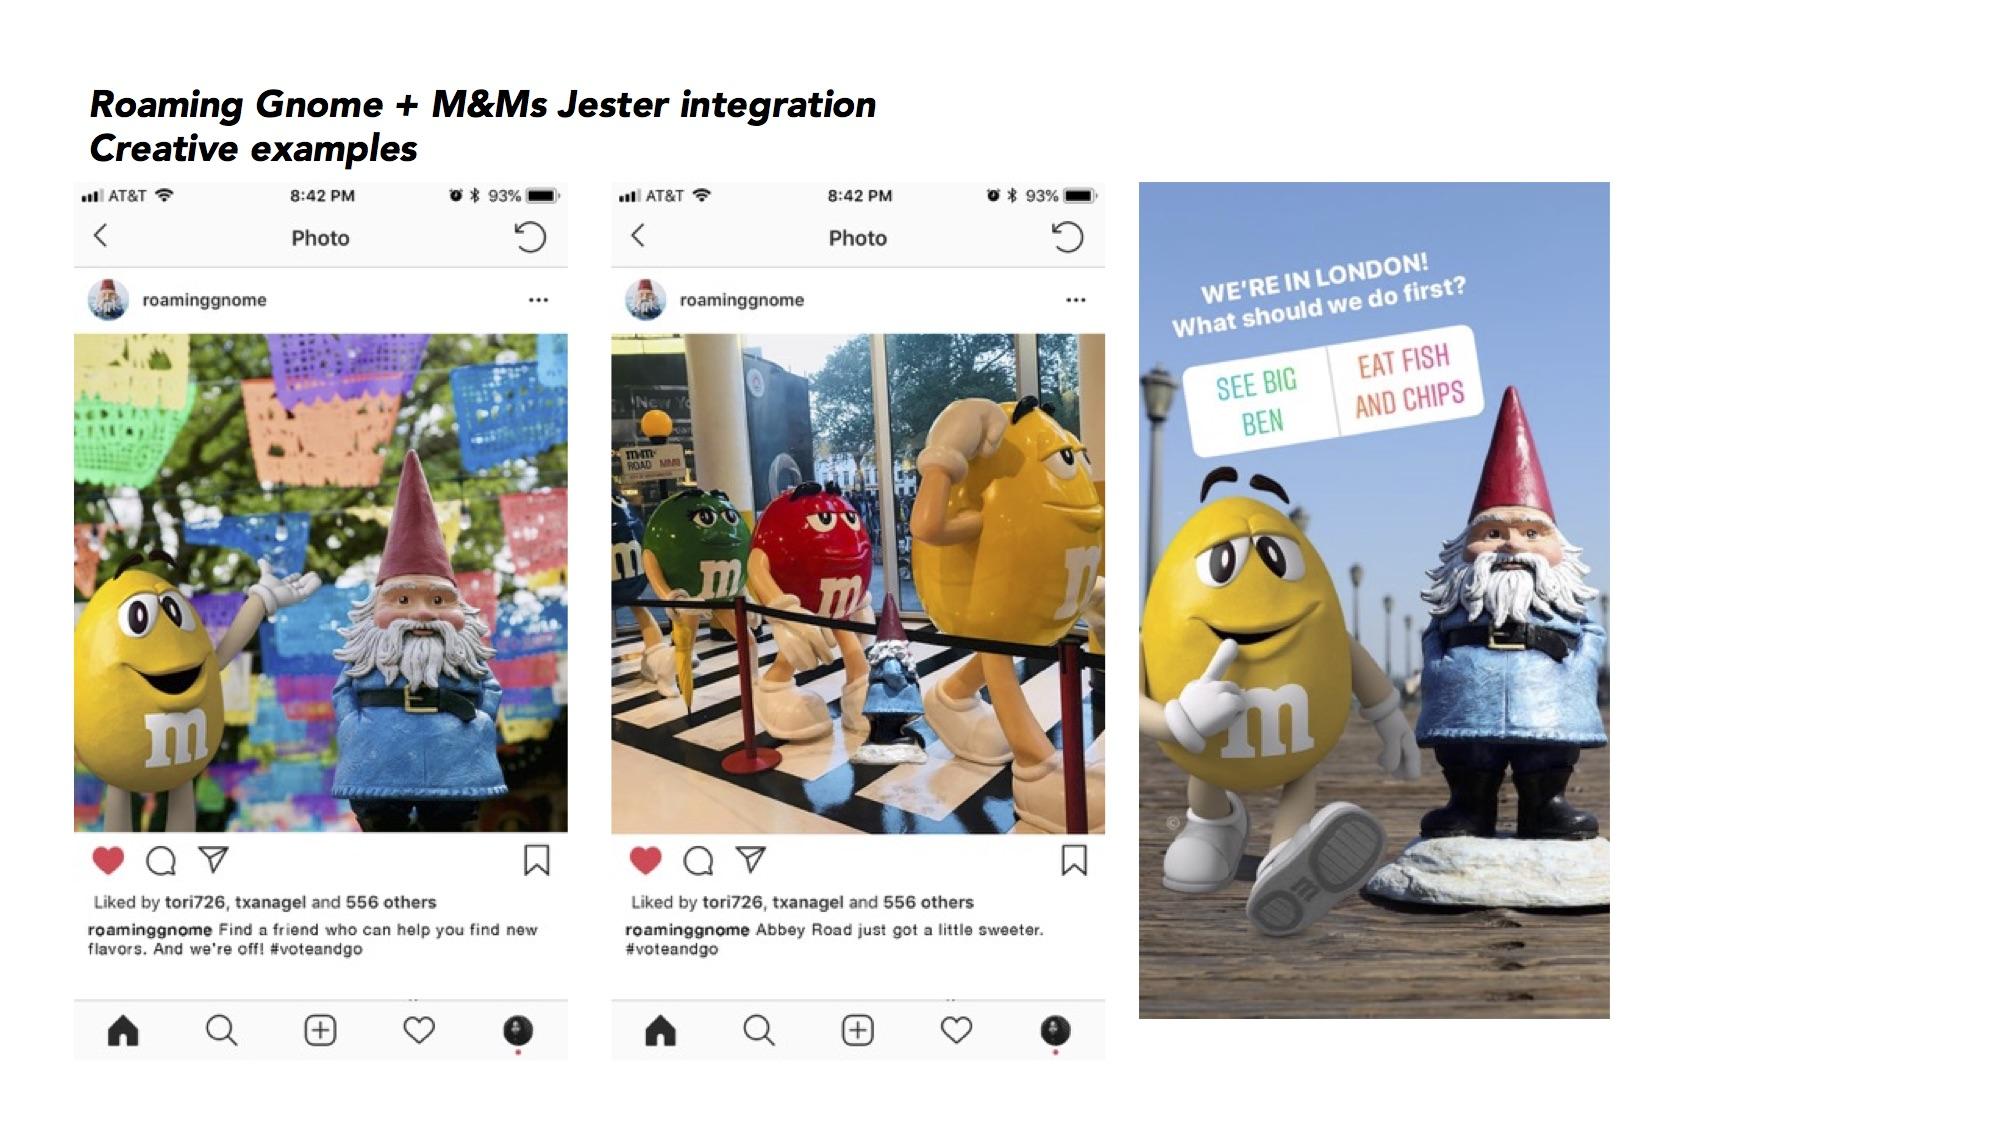 RG and MMs Creative examples -P2.jpg